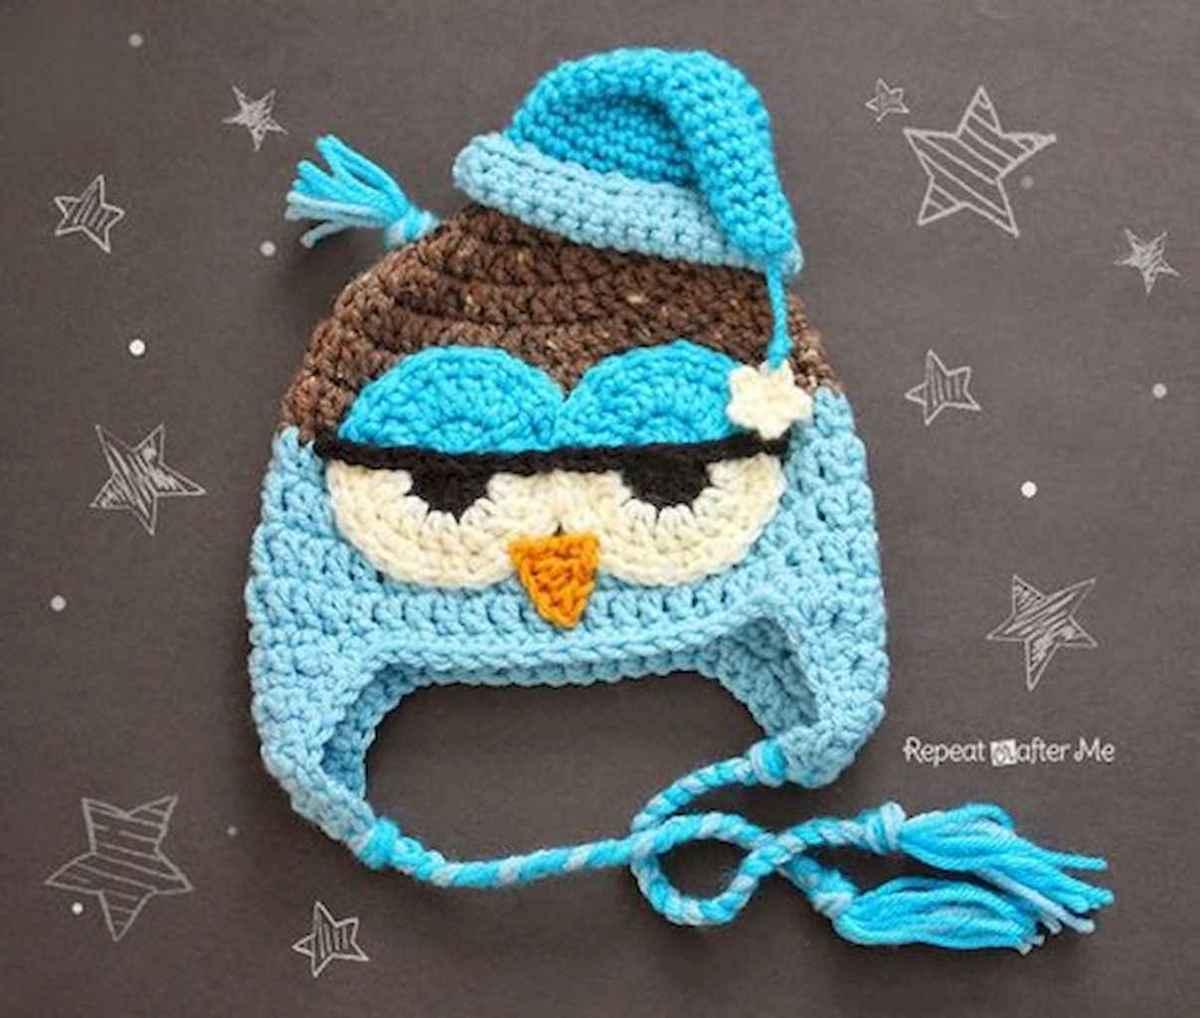 50 easy diy crochet animal scarf ideas for beginner (24)